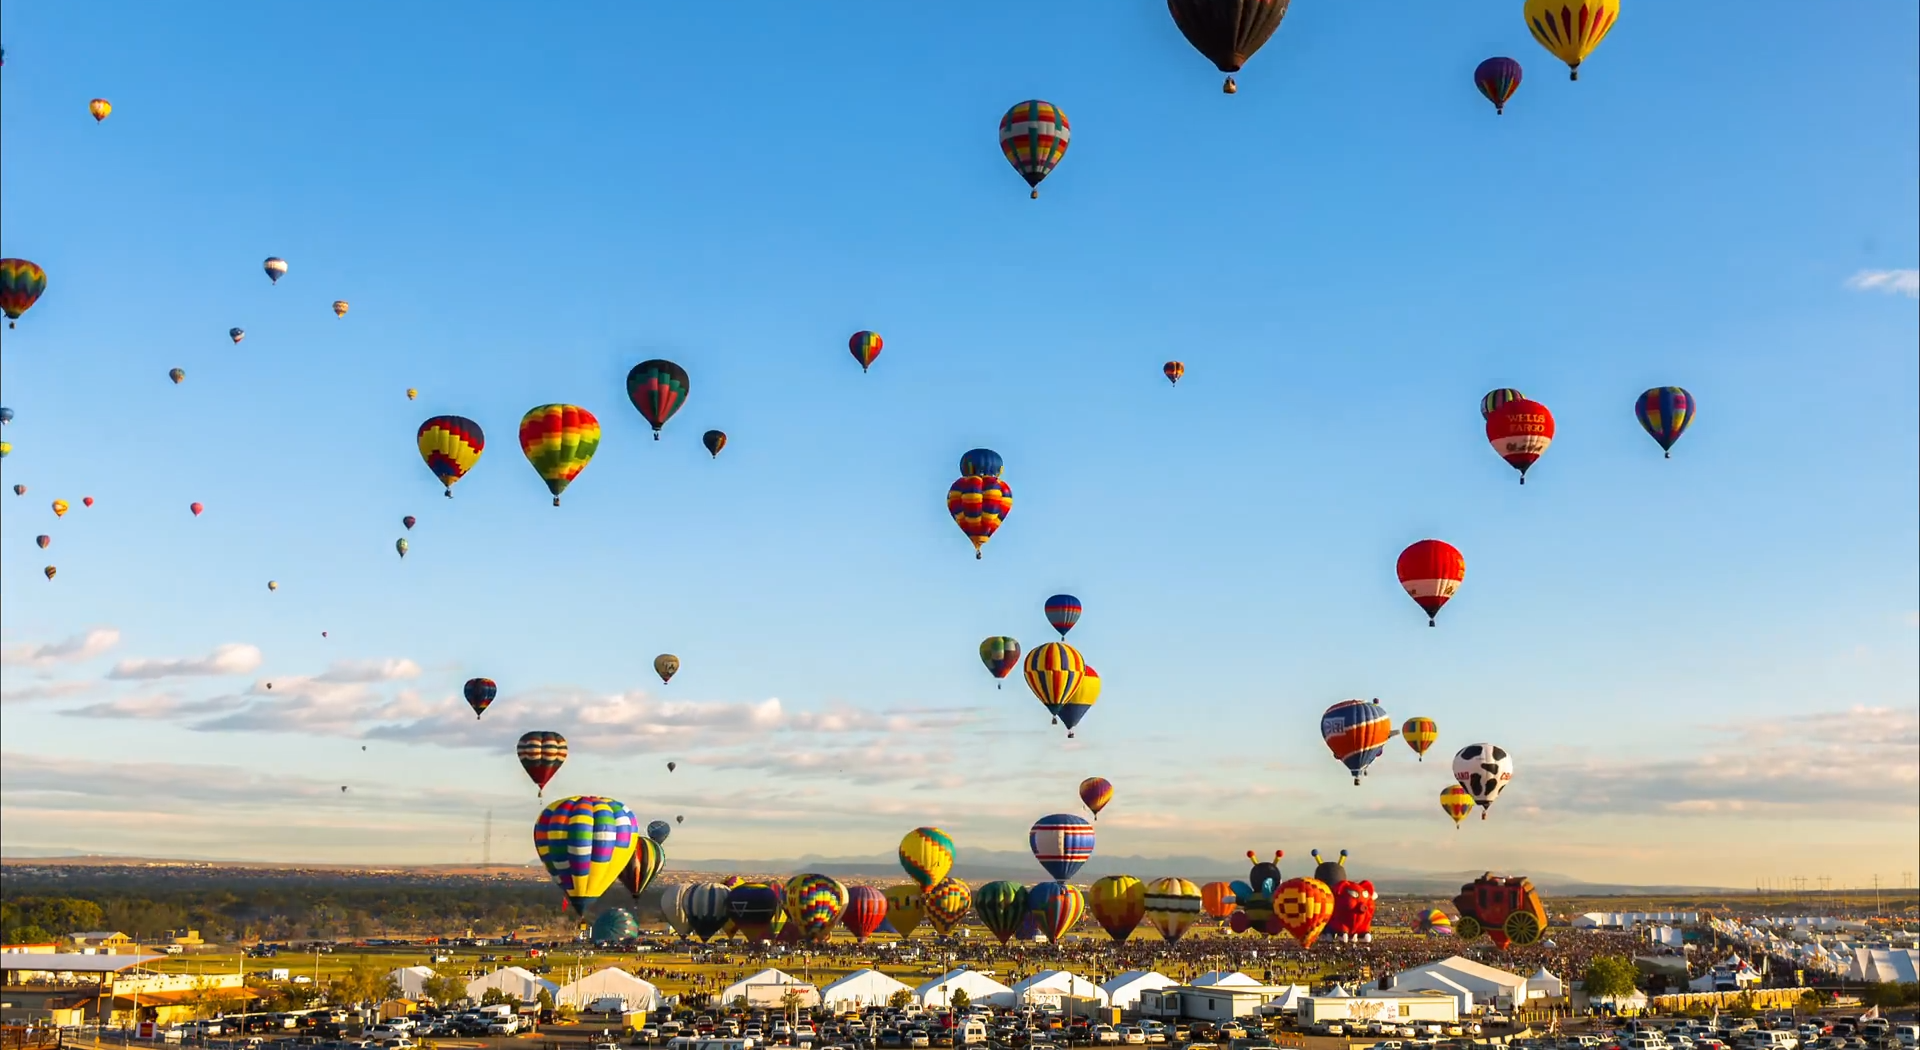 Timelapse – 700 Hot Air Balloons